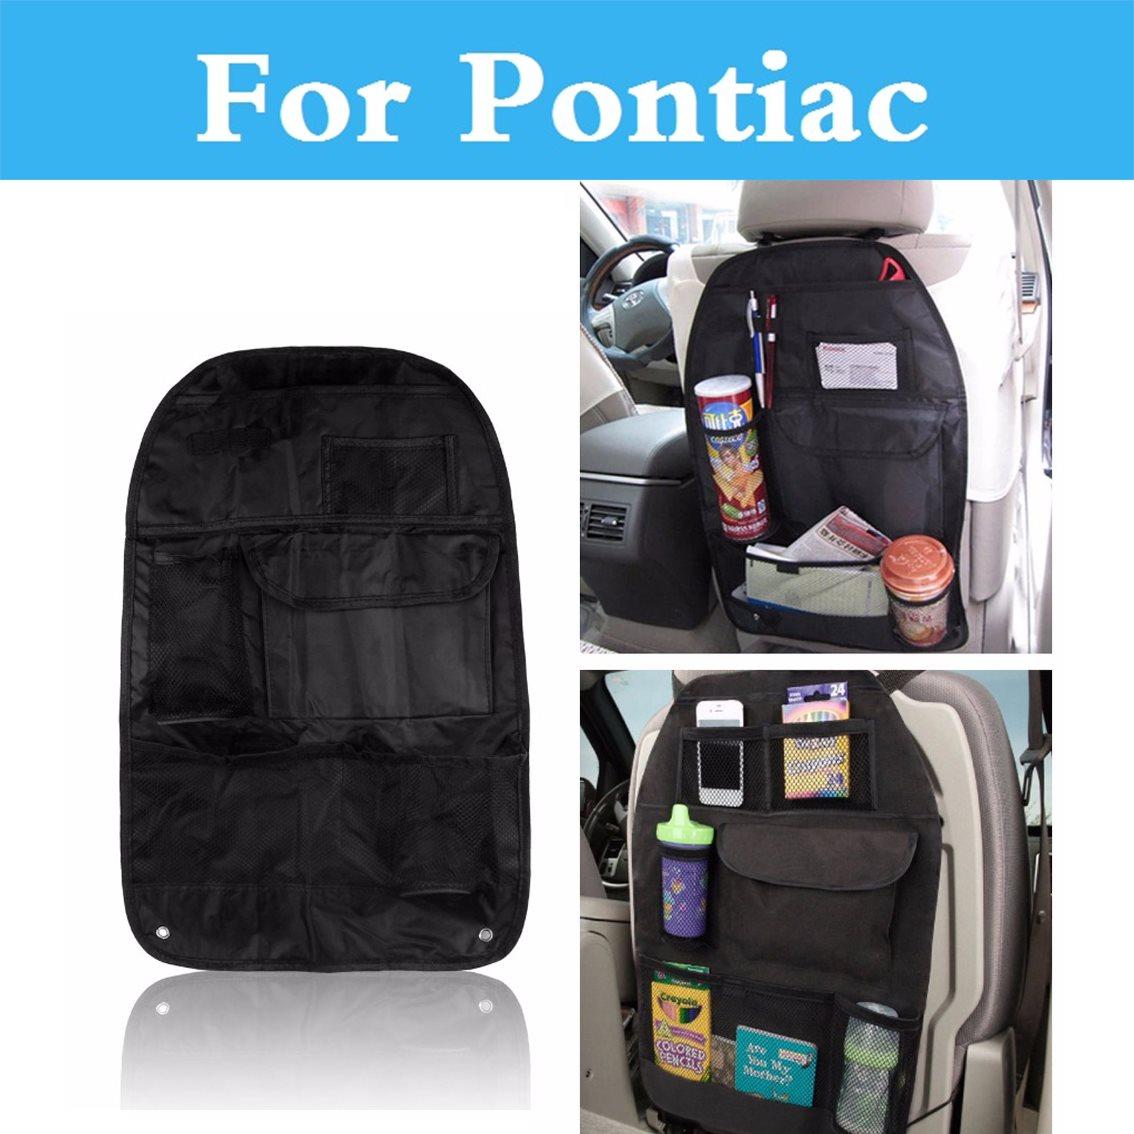 Auto Multi-Bolsillo asiento trasero bolsa organizador taza almacenamiento de alimentos para Pontiac Solstice Sunfire Torrent Grand Prix gto